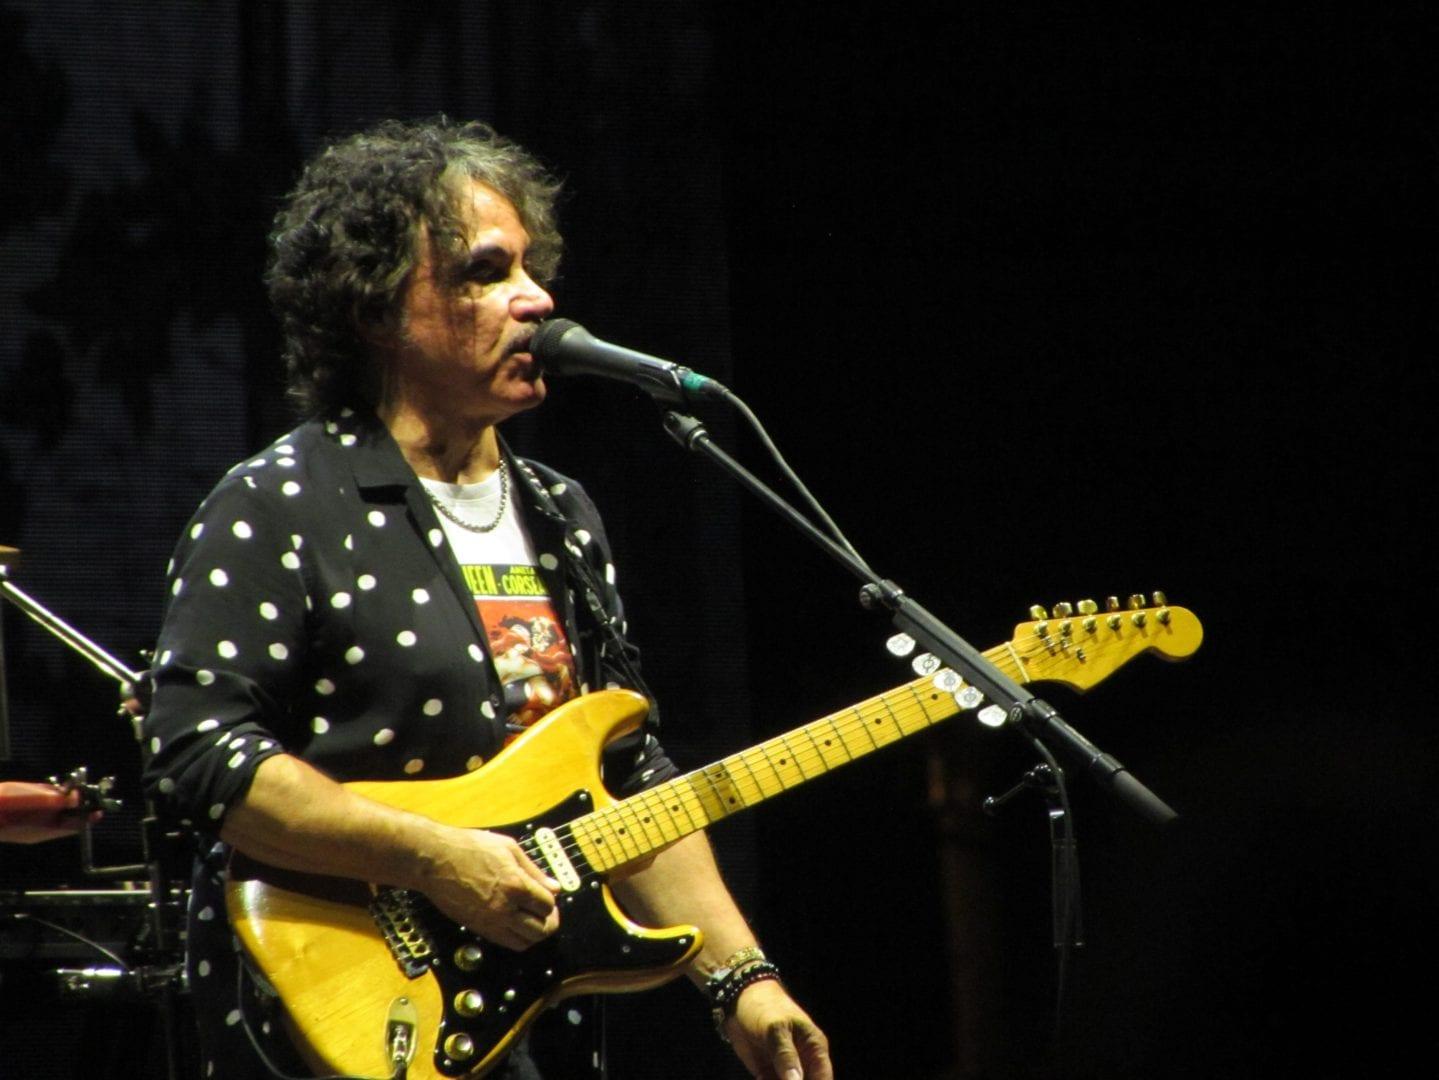 John Oates holding a guitar